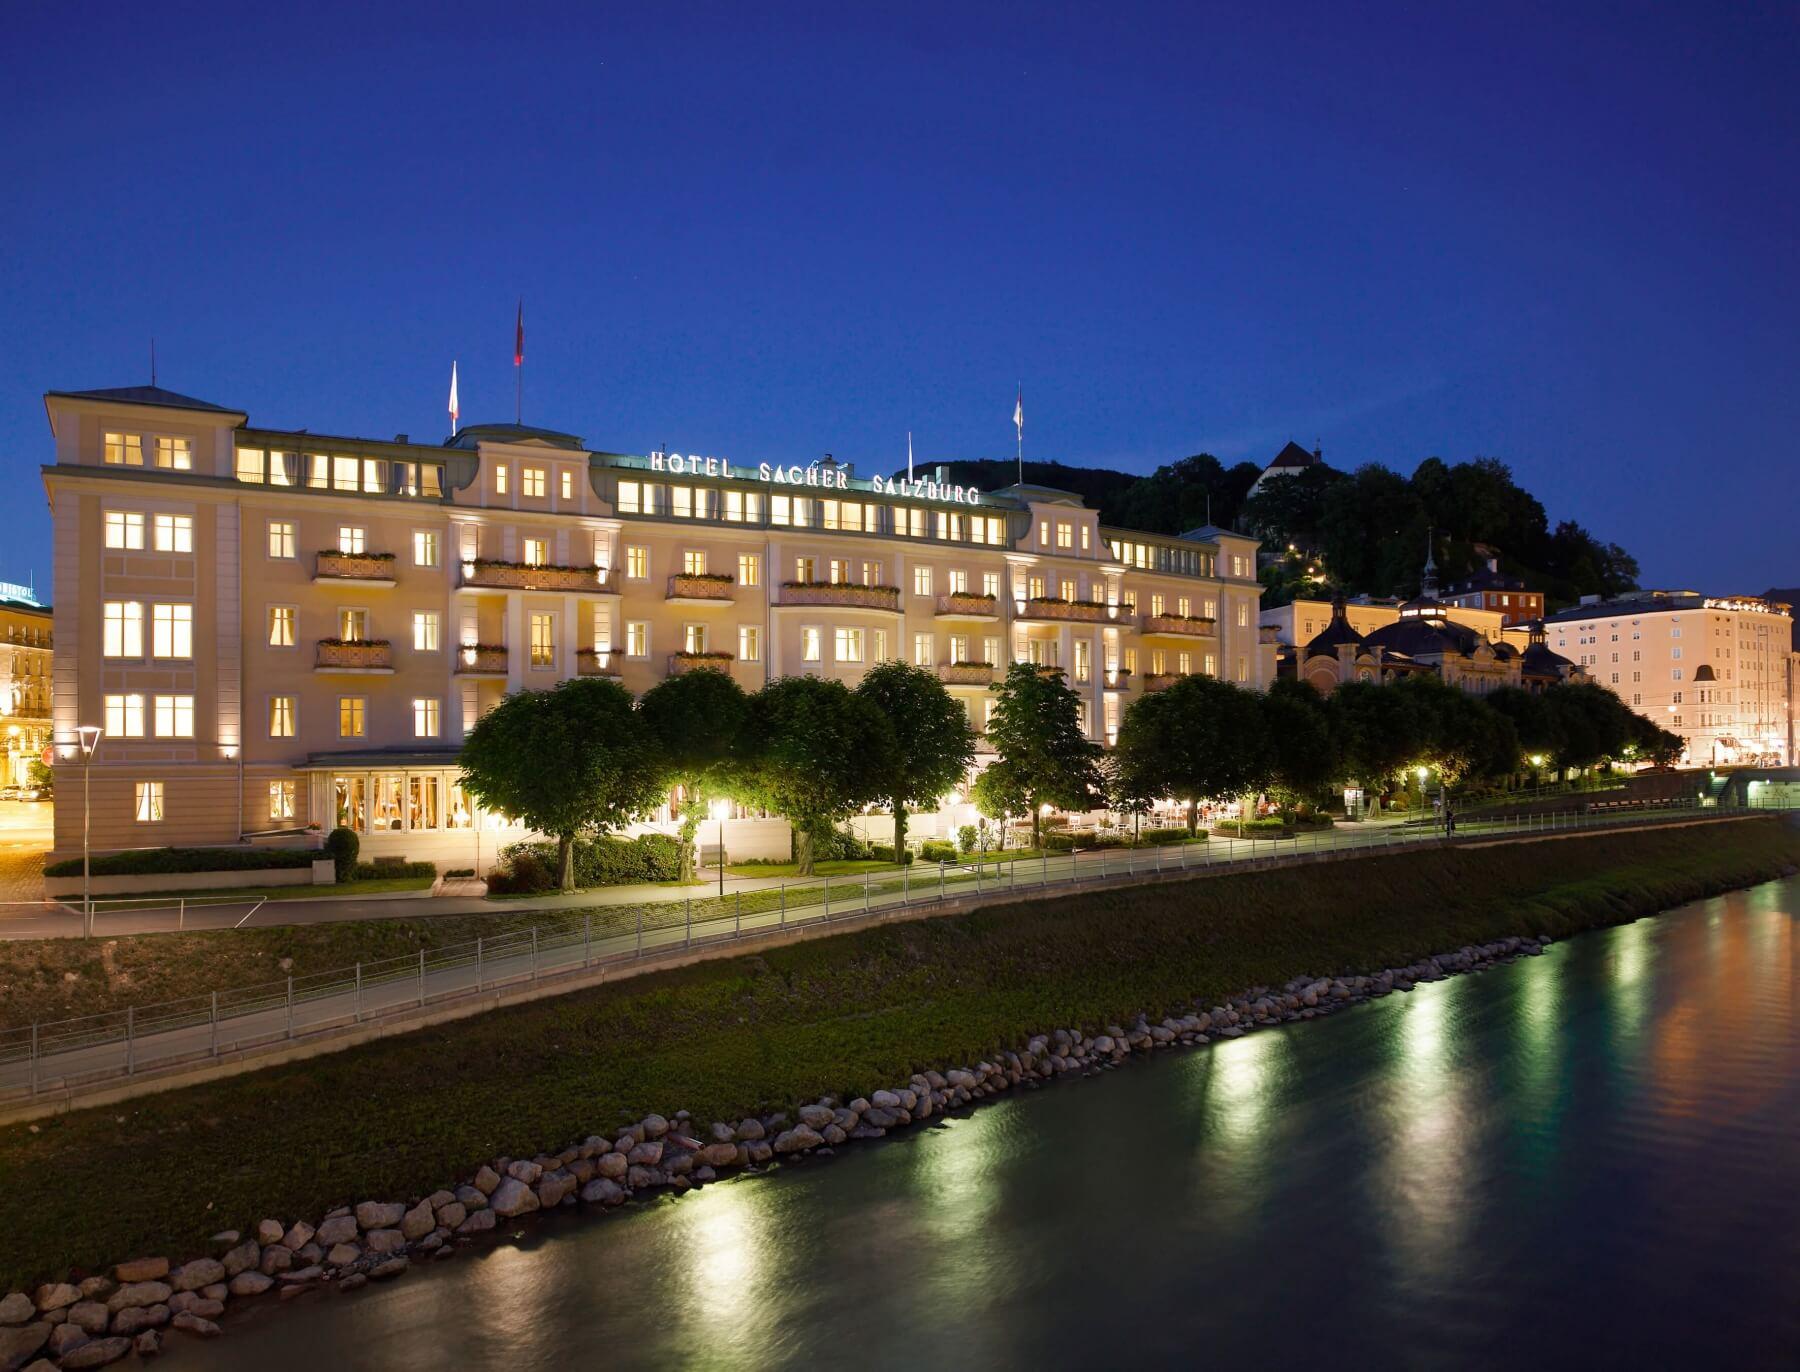 the Hotel Sacher of Salzburg